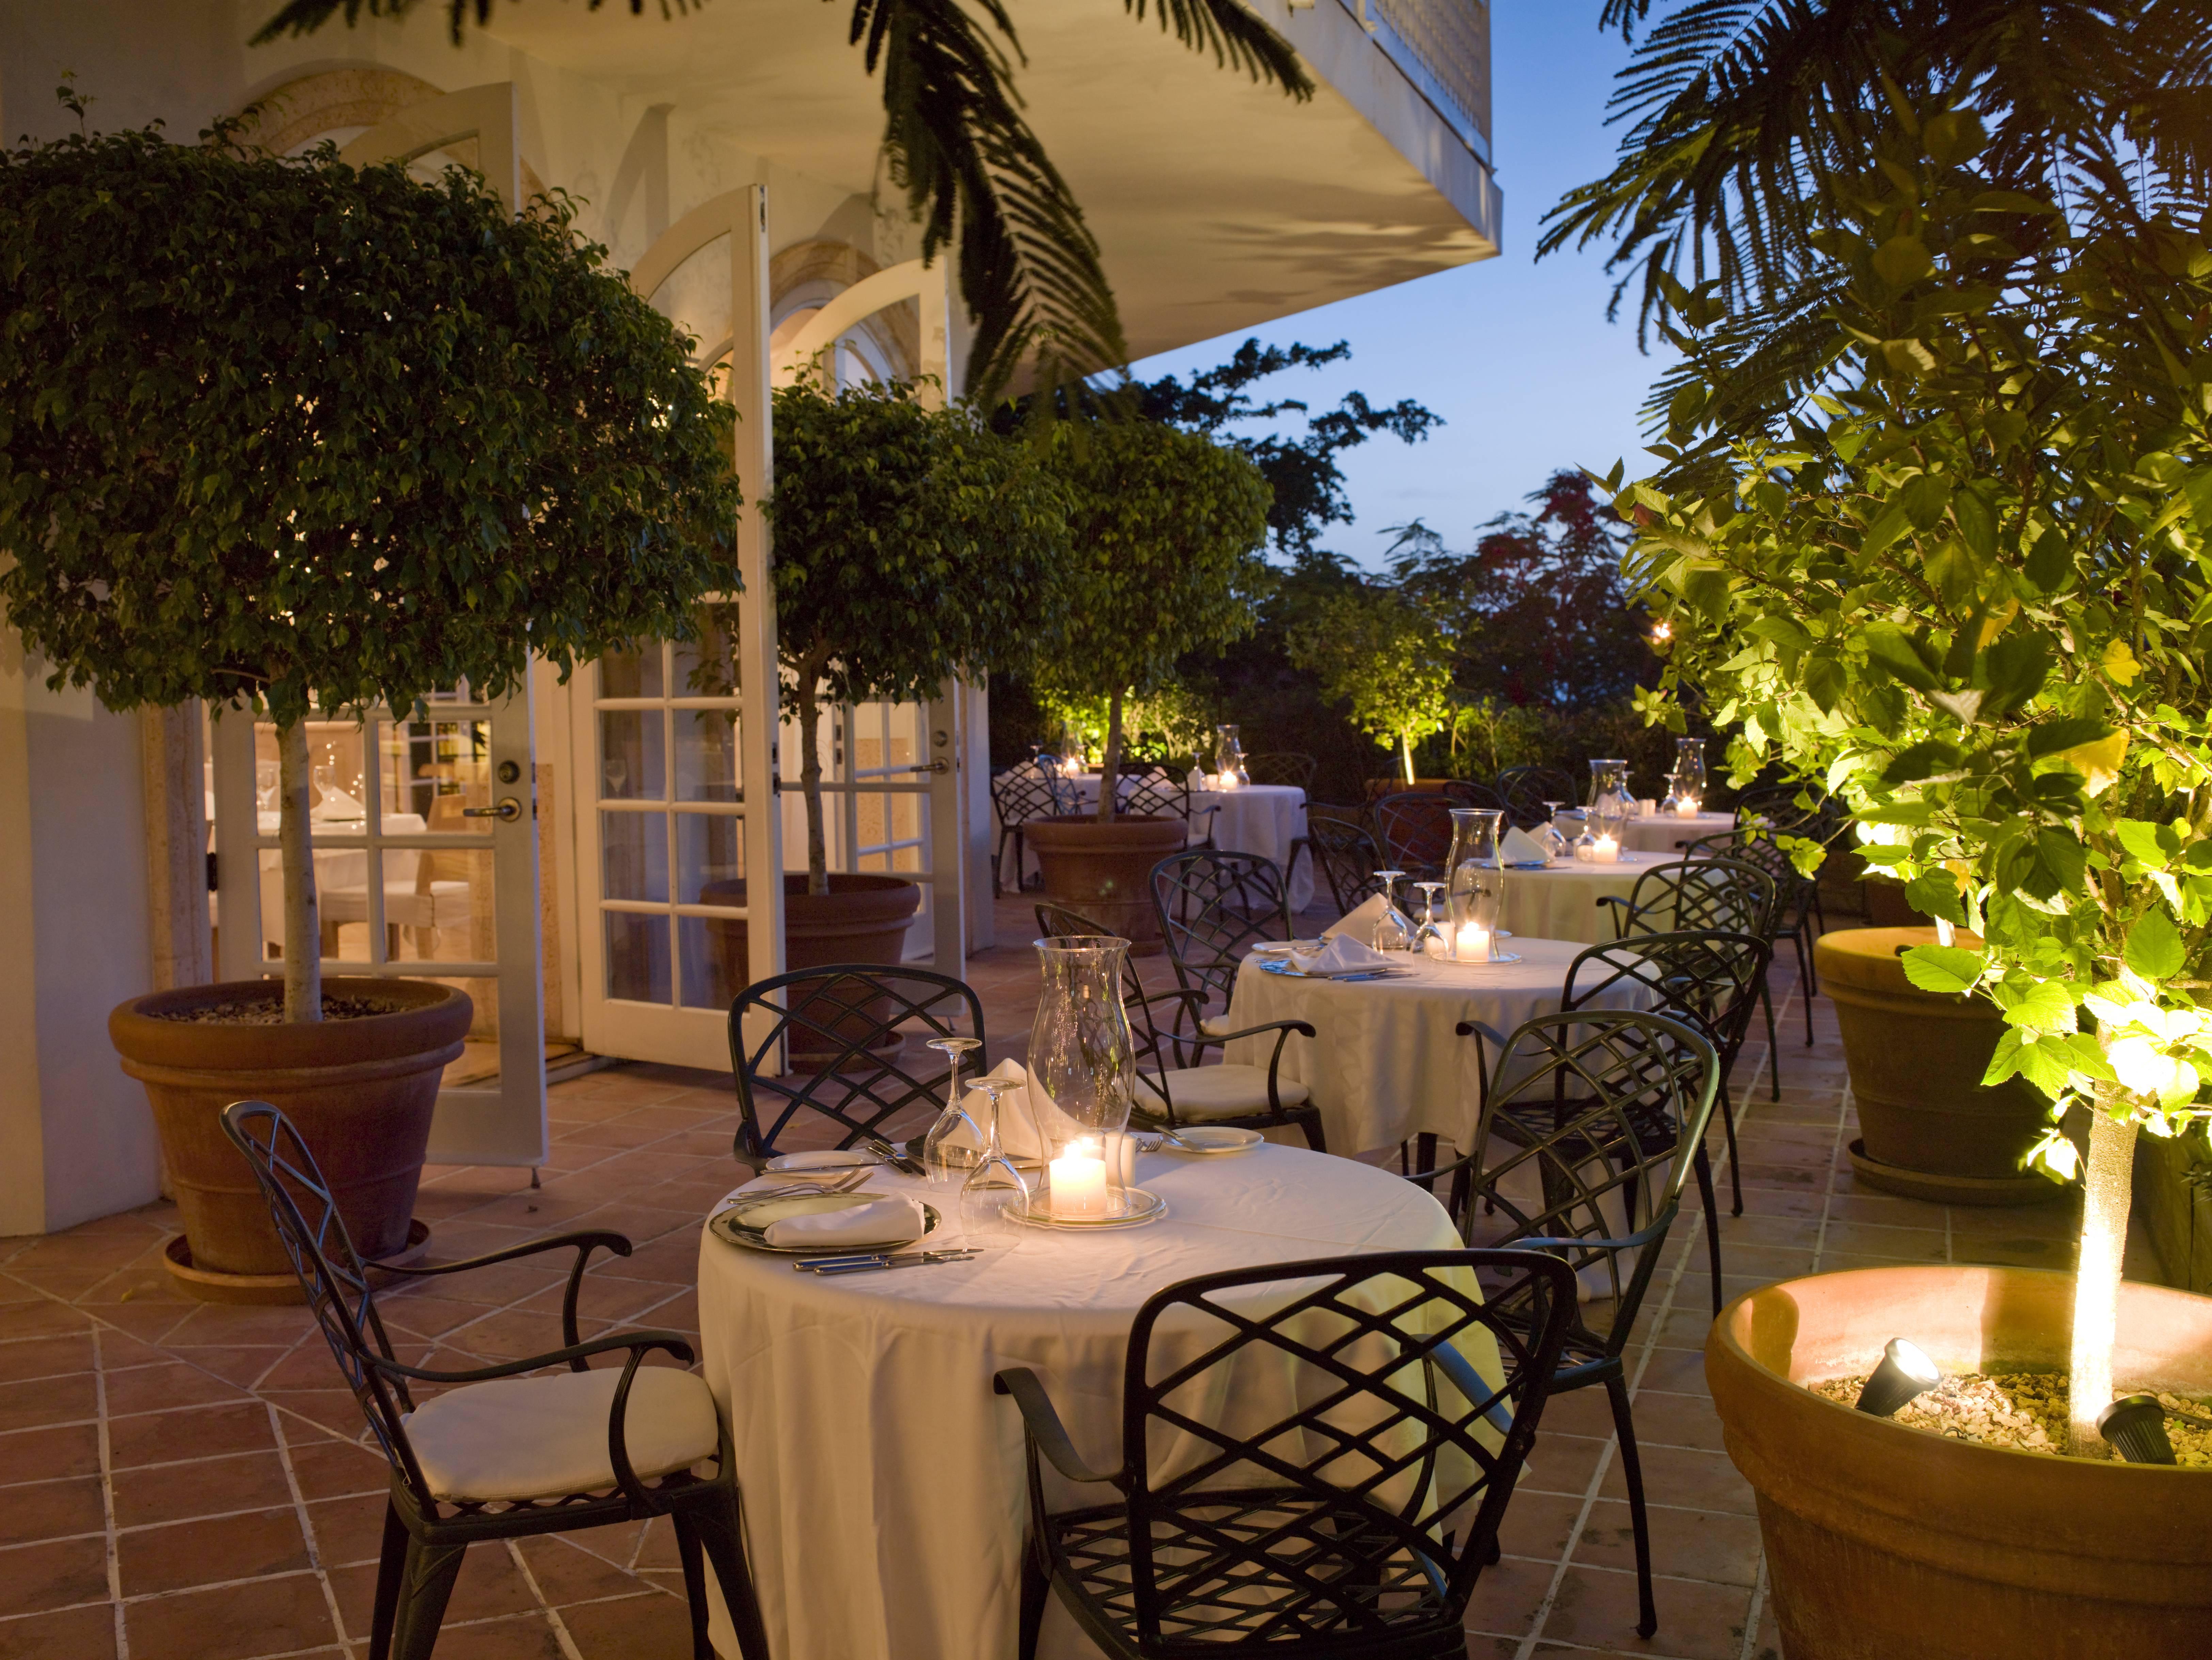 Terrace Restaurant patio